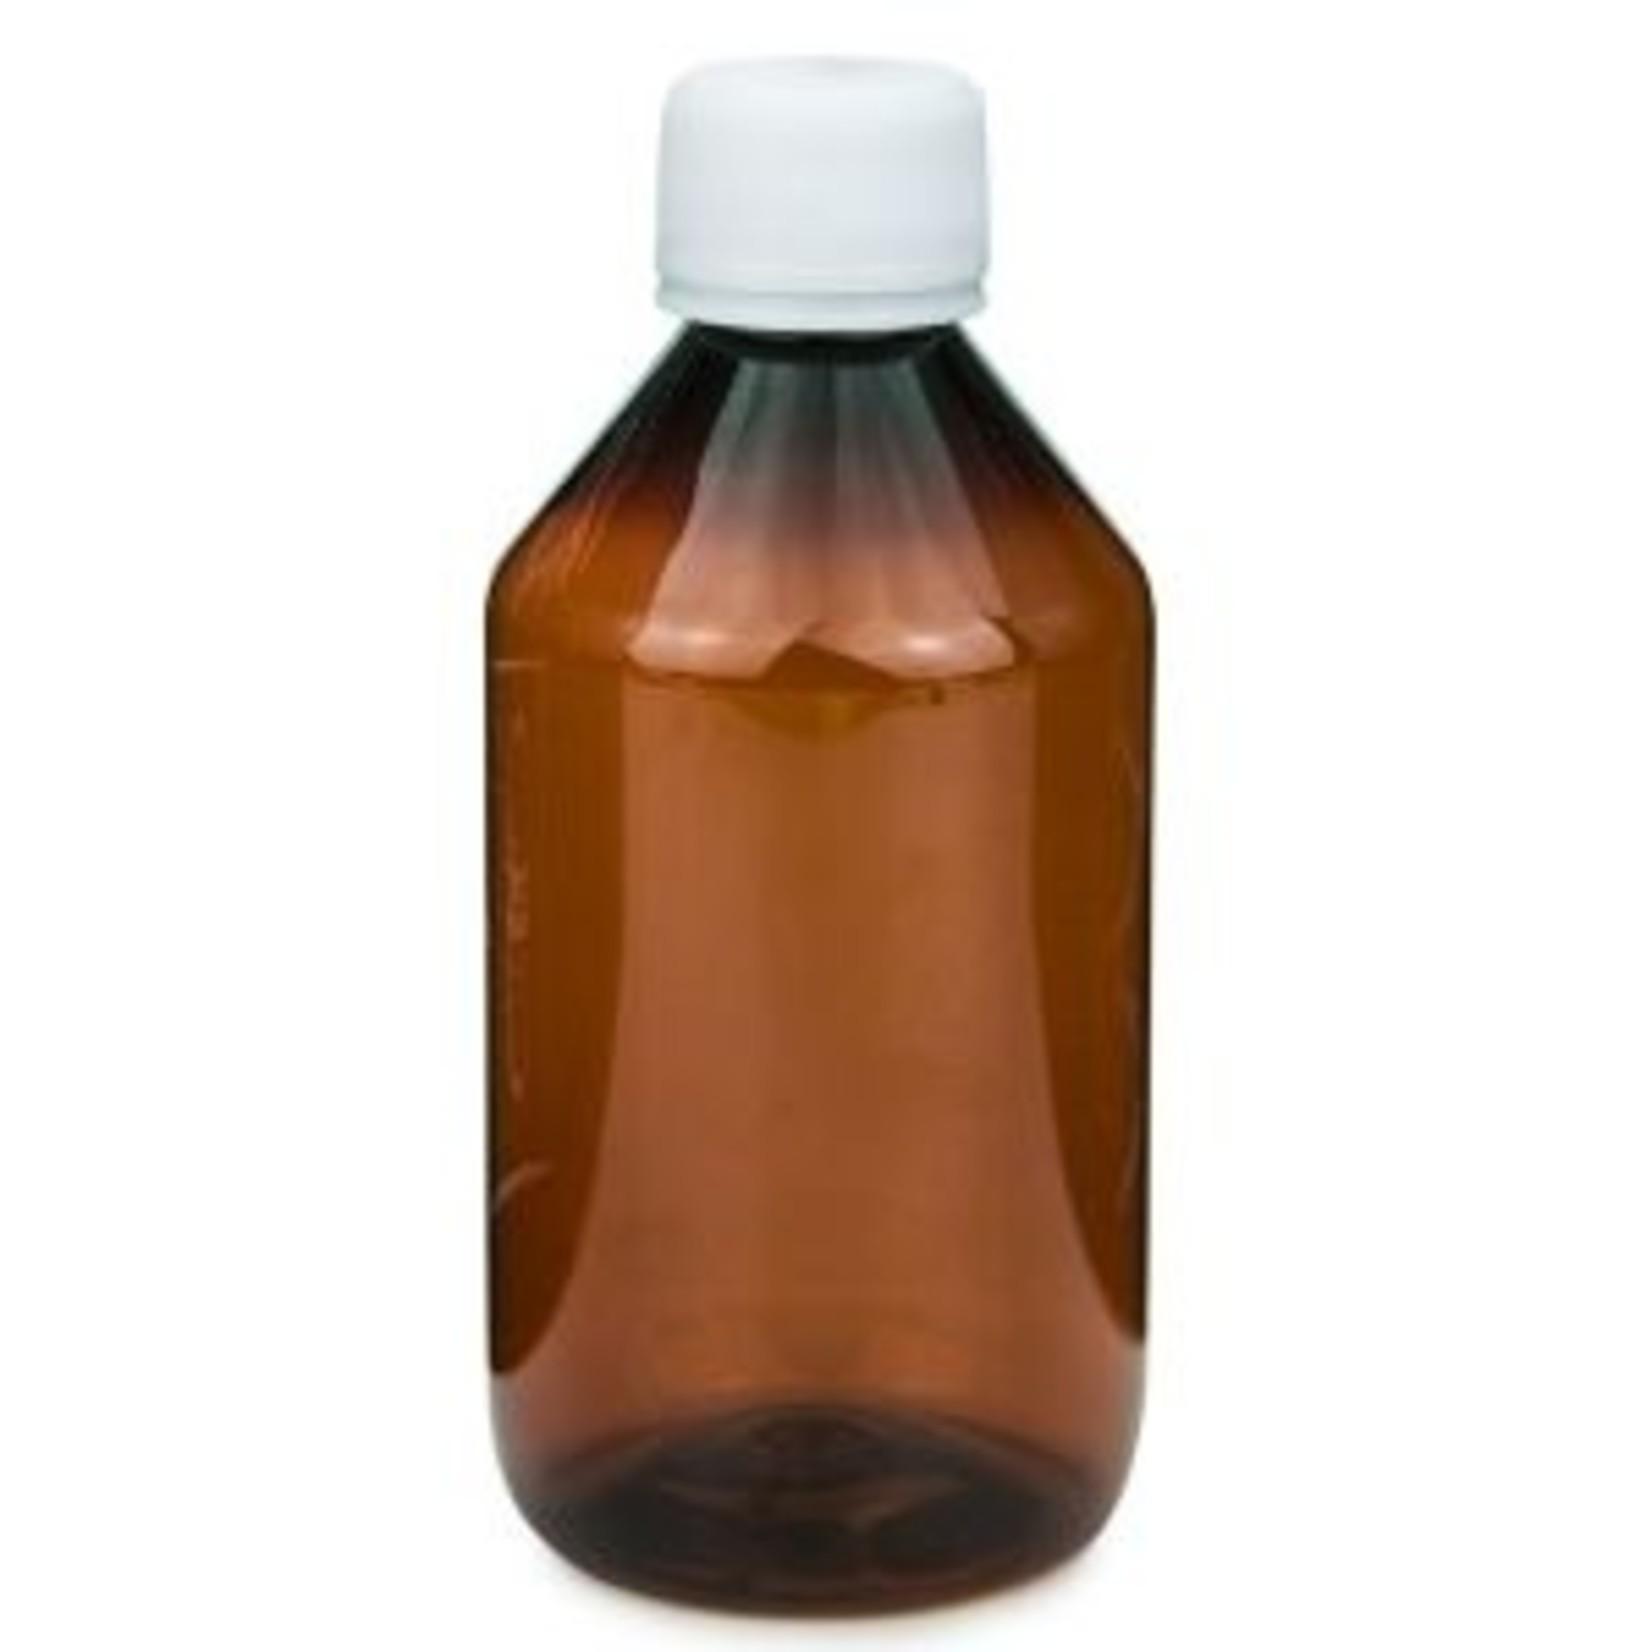 PG Nikotin-Salz Base 3-36 mg/ml 250-1000ml